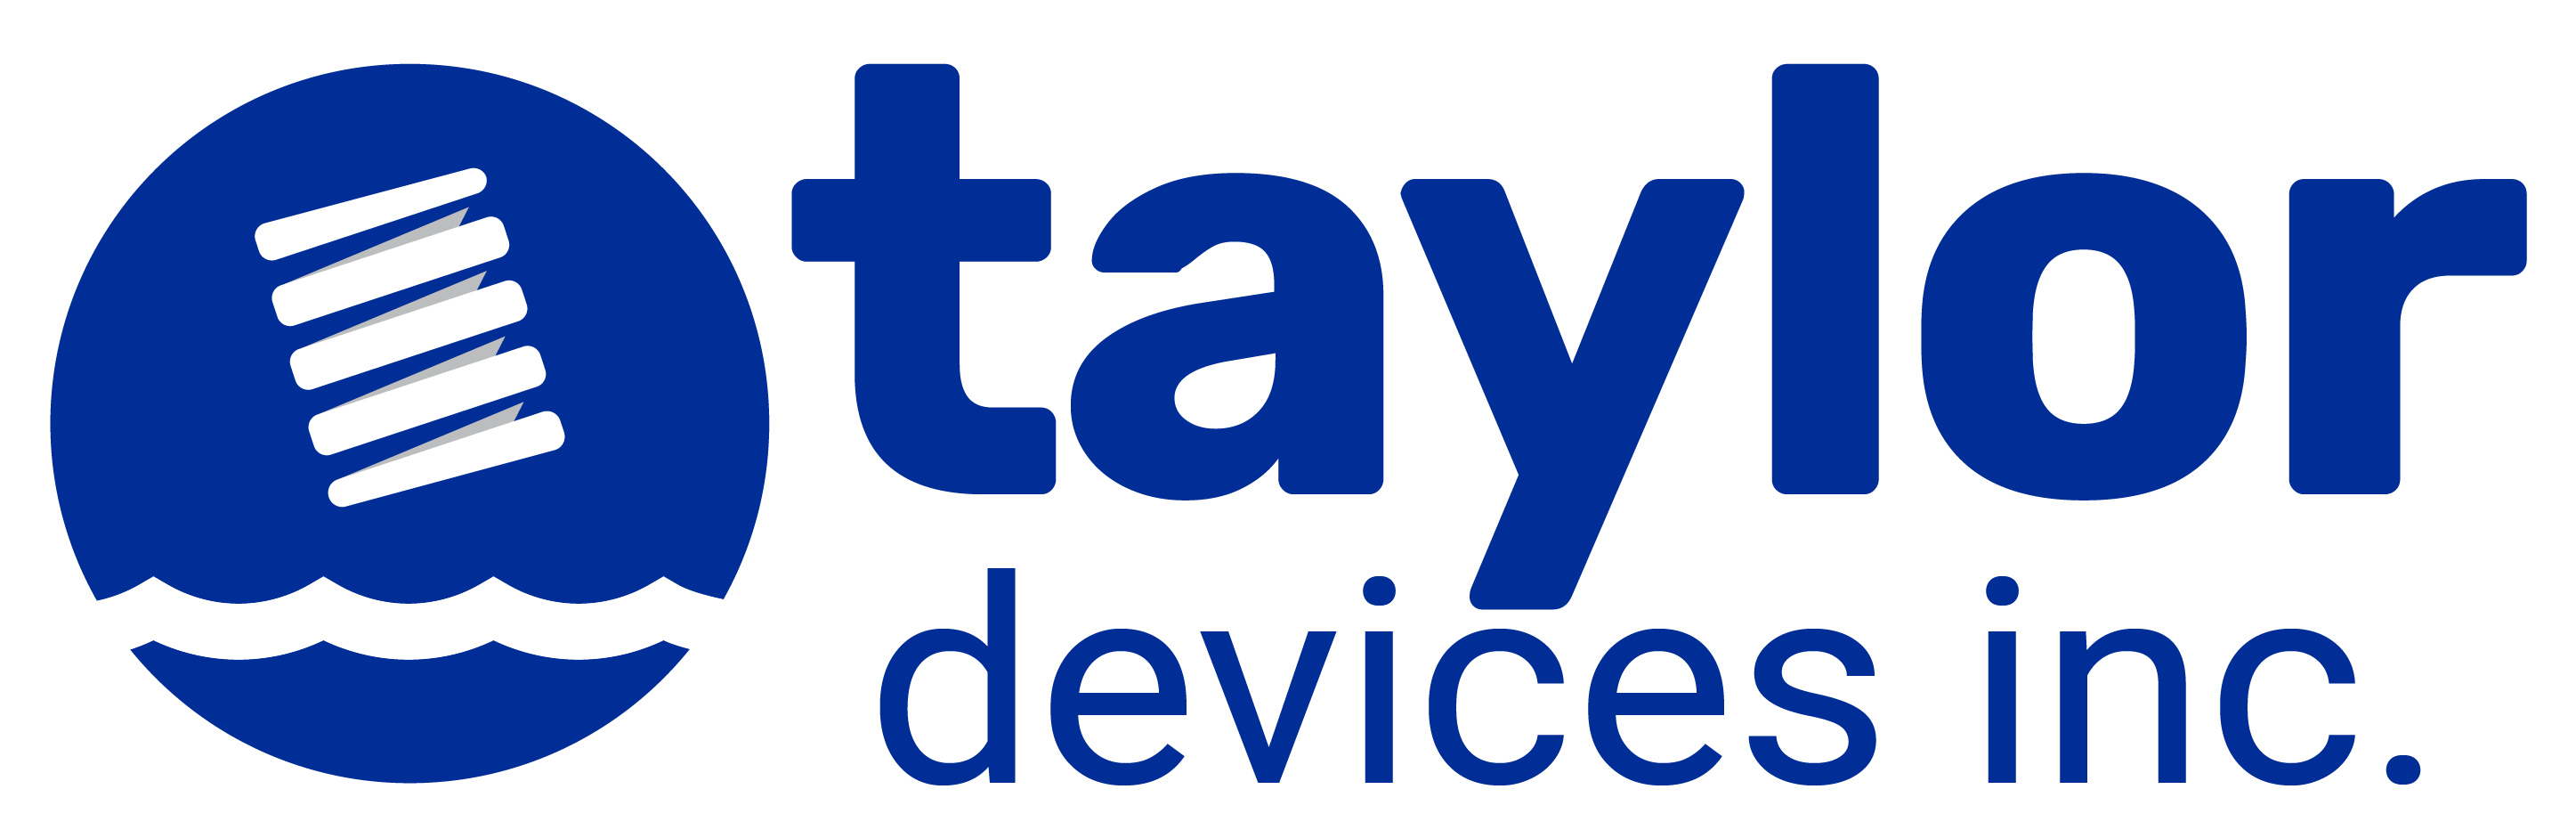 Taylor Devices_大陸琢白